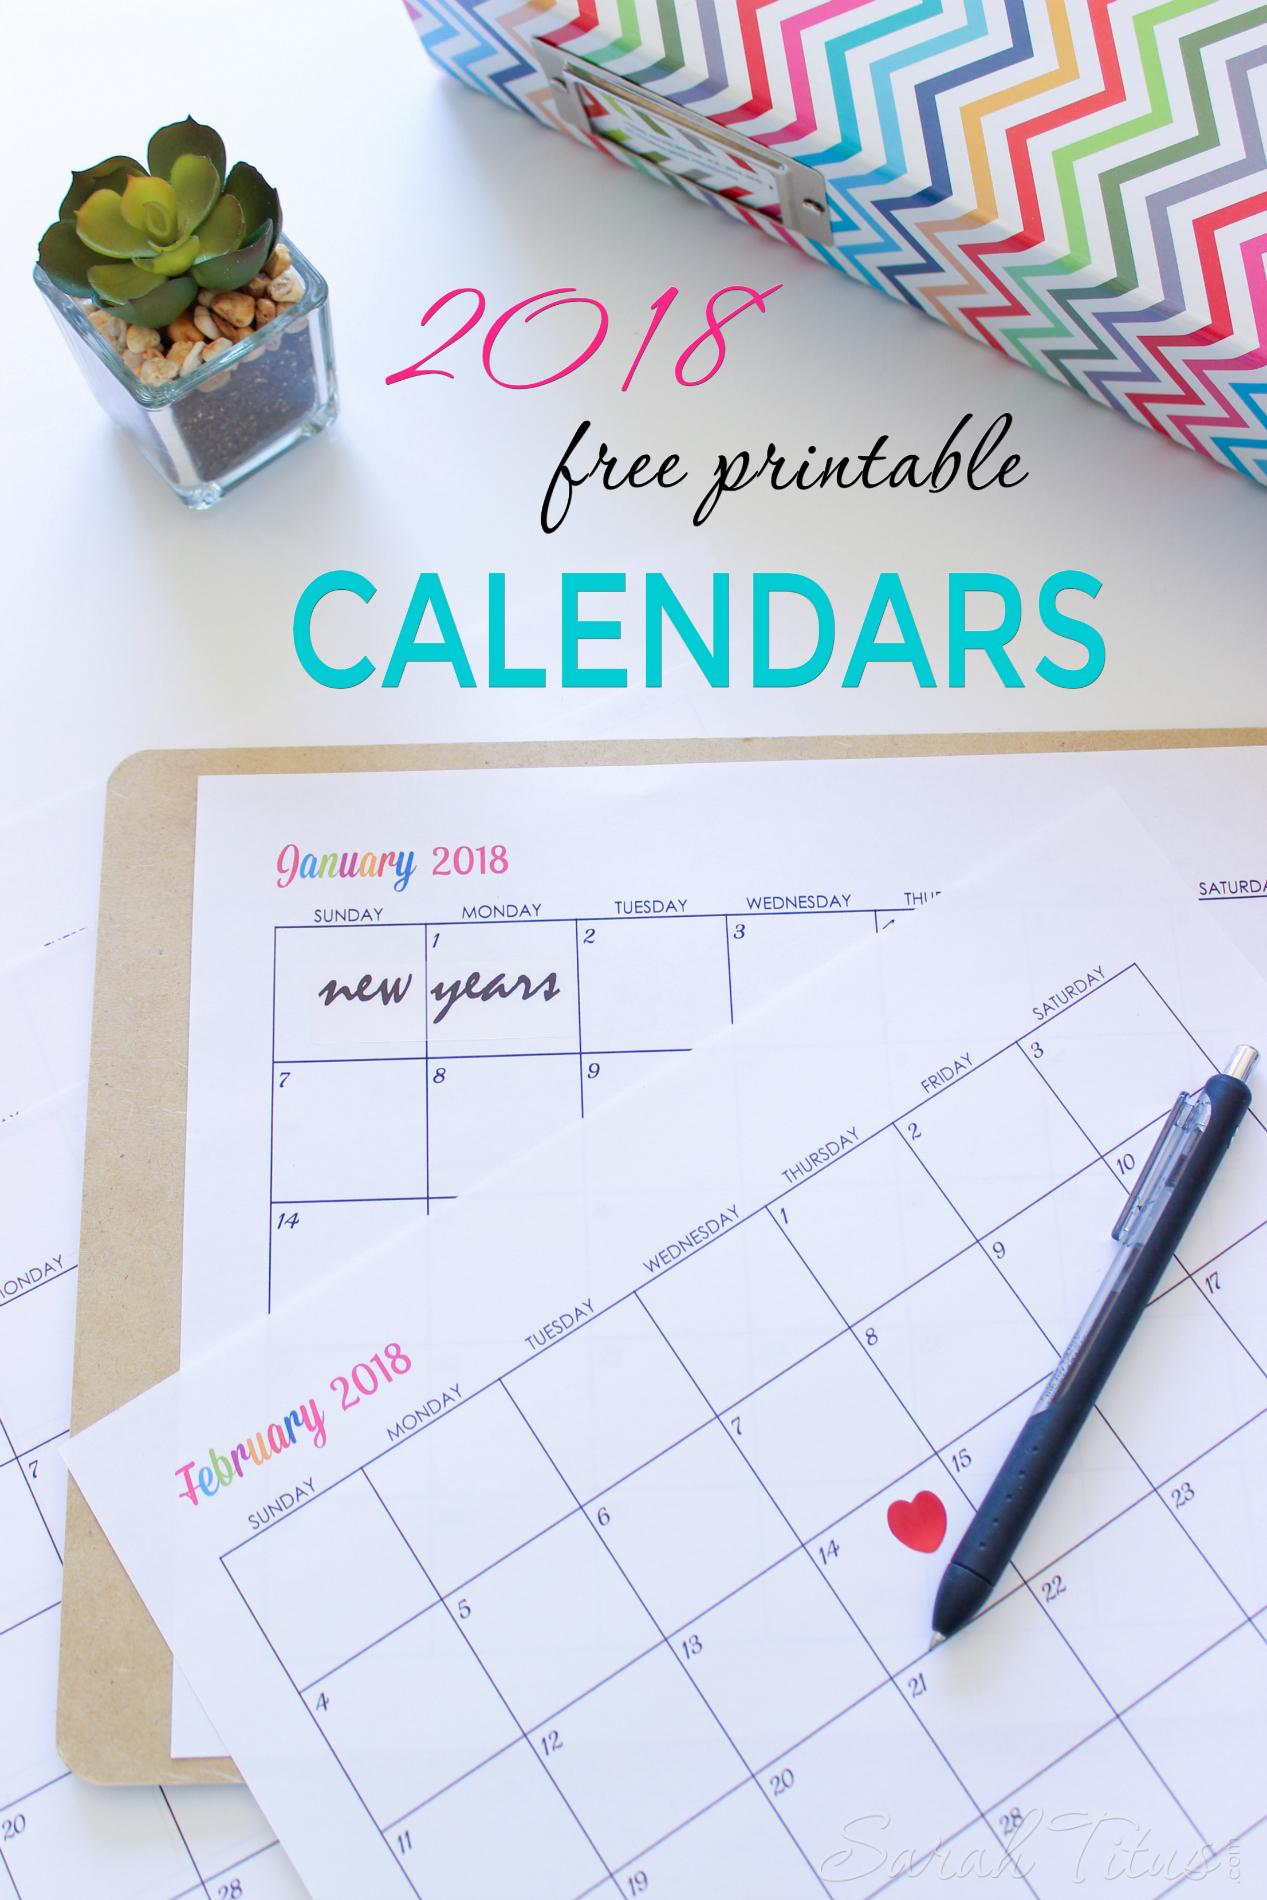 Custom Editable Free Printable 2018 Calendars - Sarah Titus - Free 2018 Planner Printable